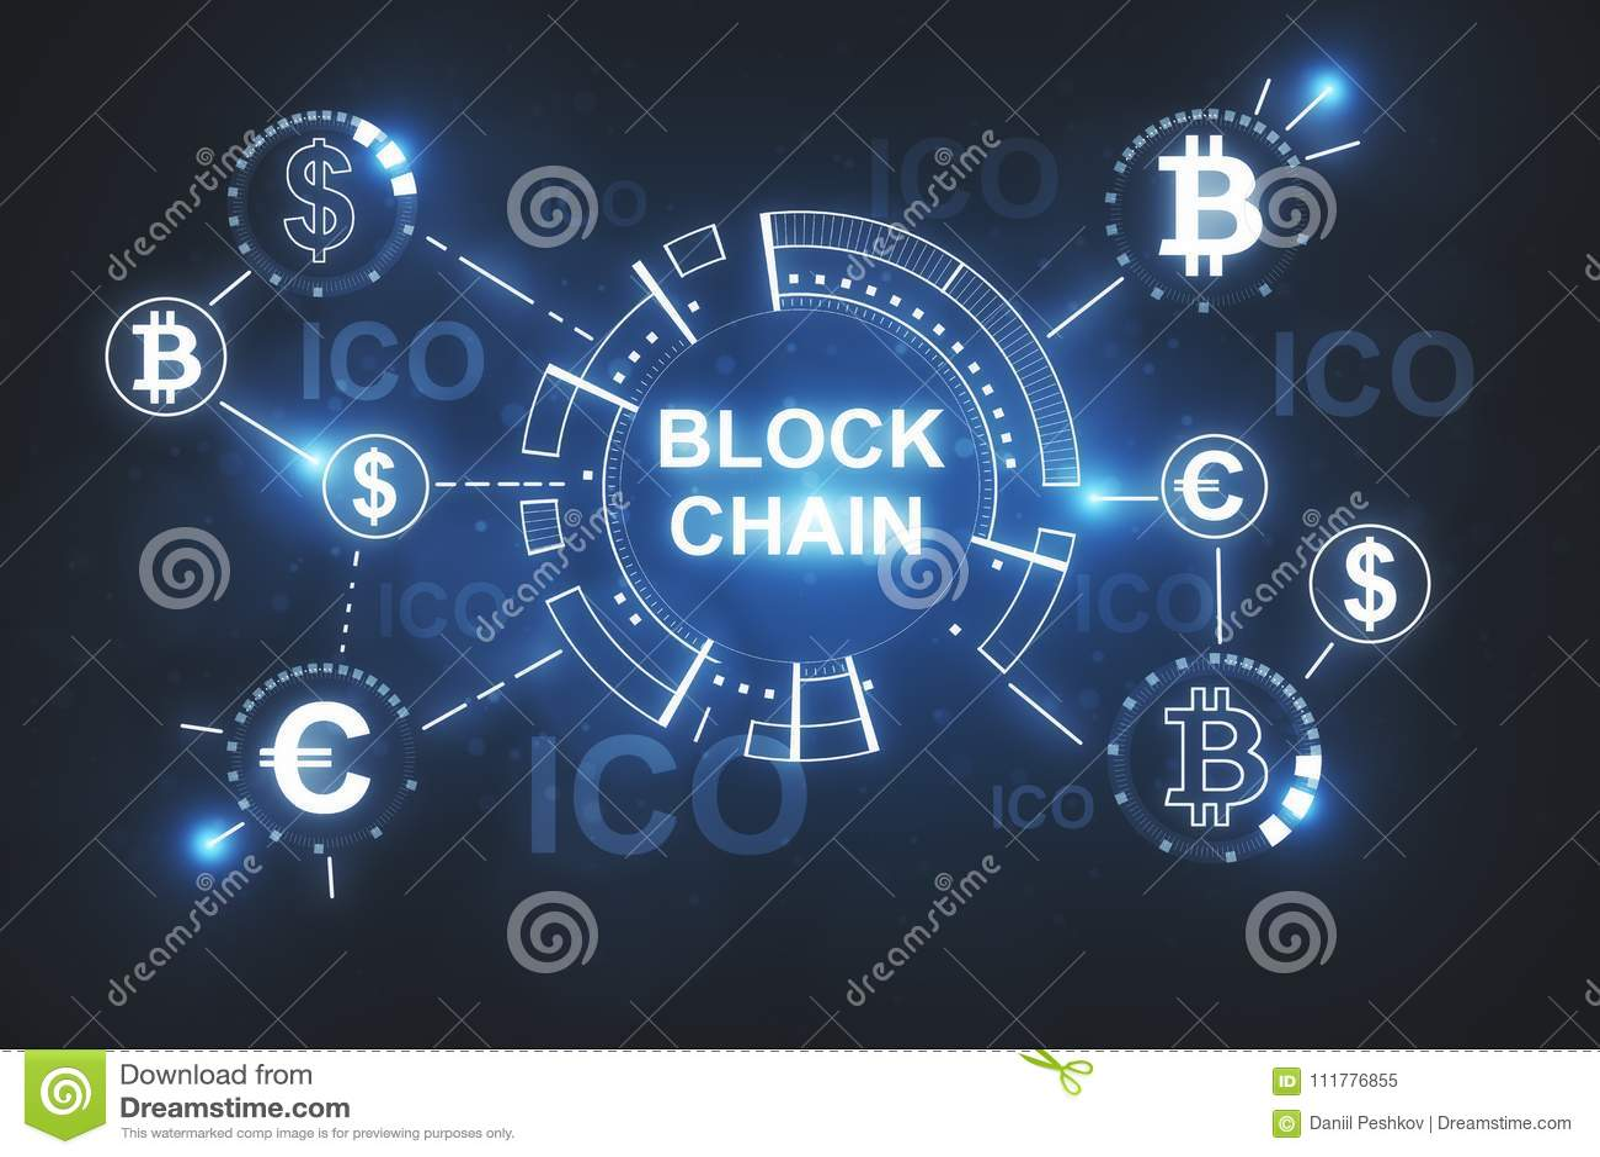 Creative blockchain wallpaper